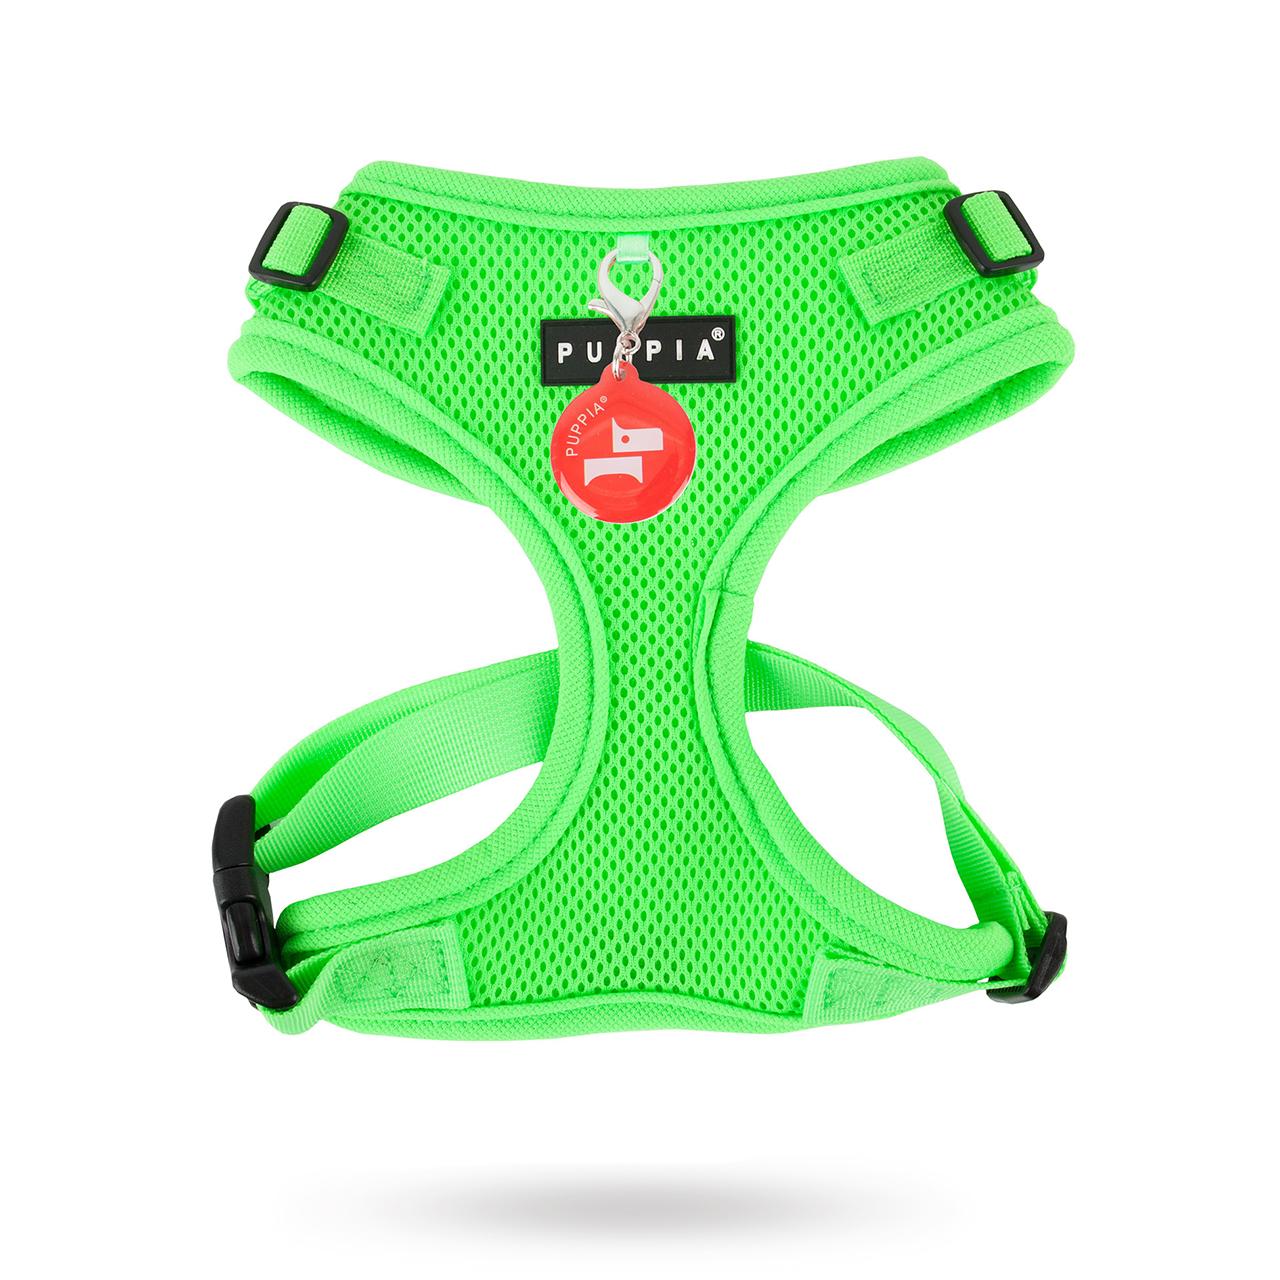 RITEFIT NEON SOFT Green - Hundsele